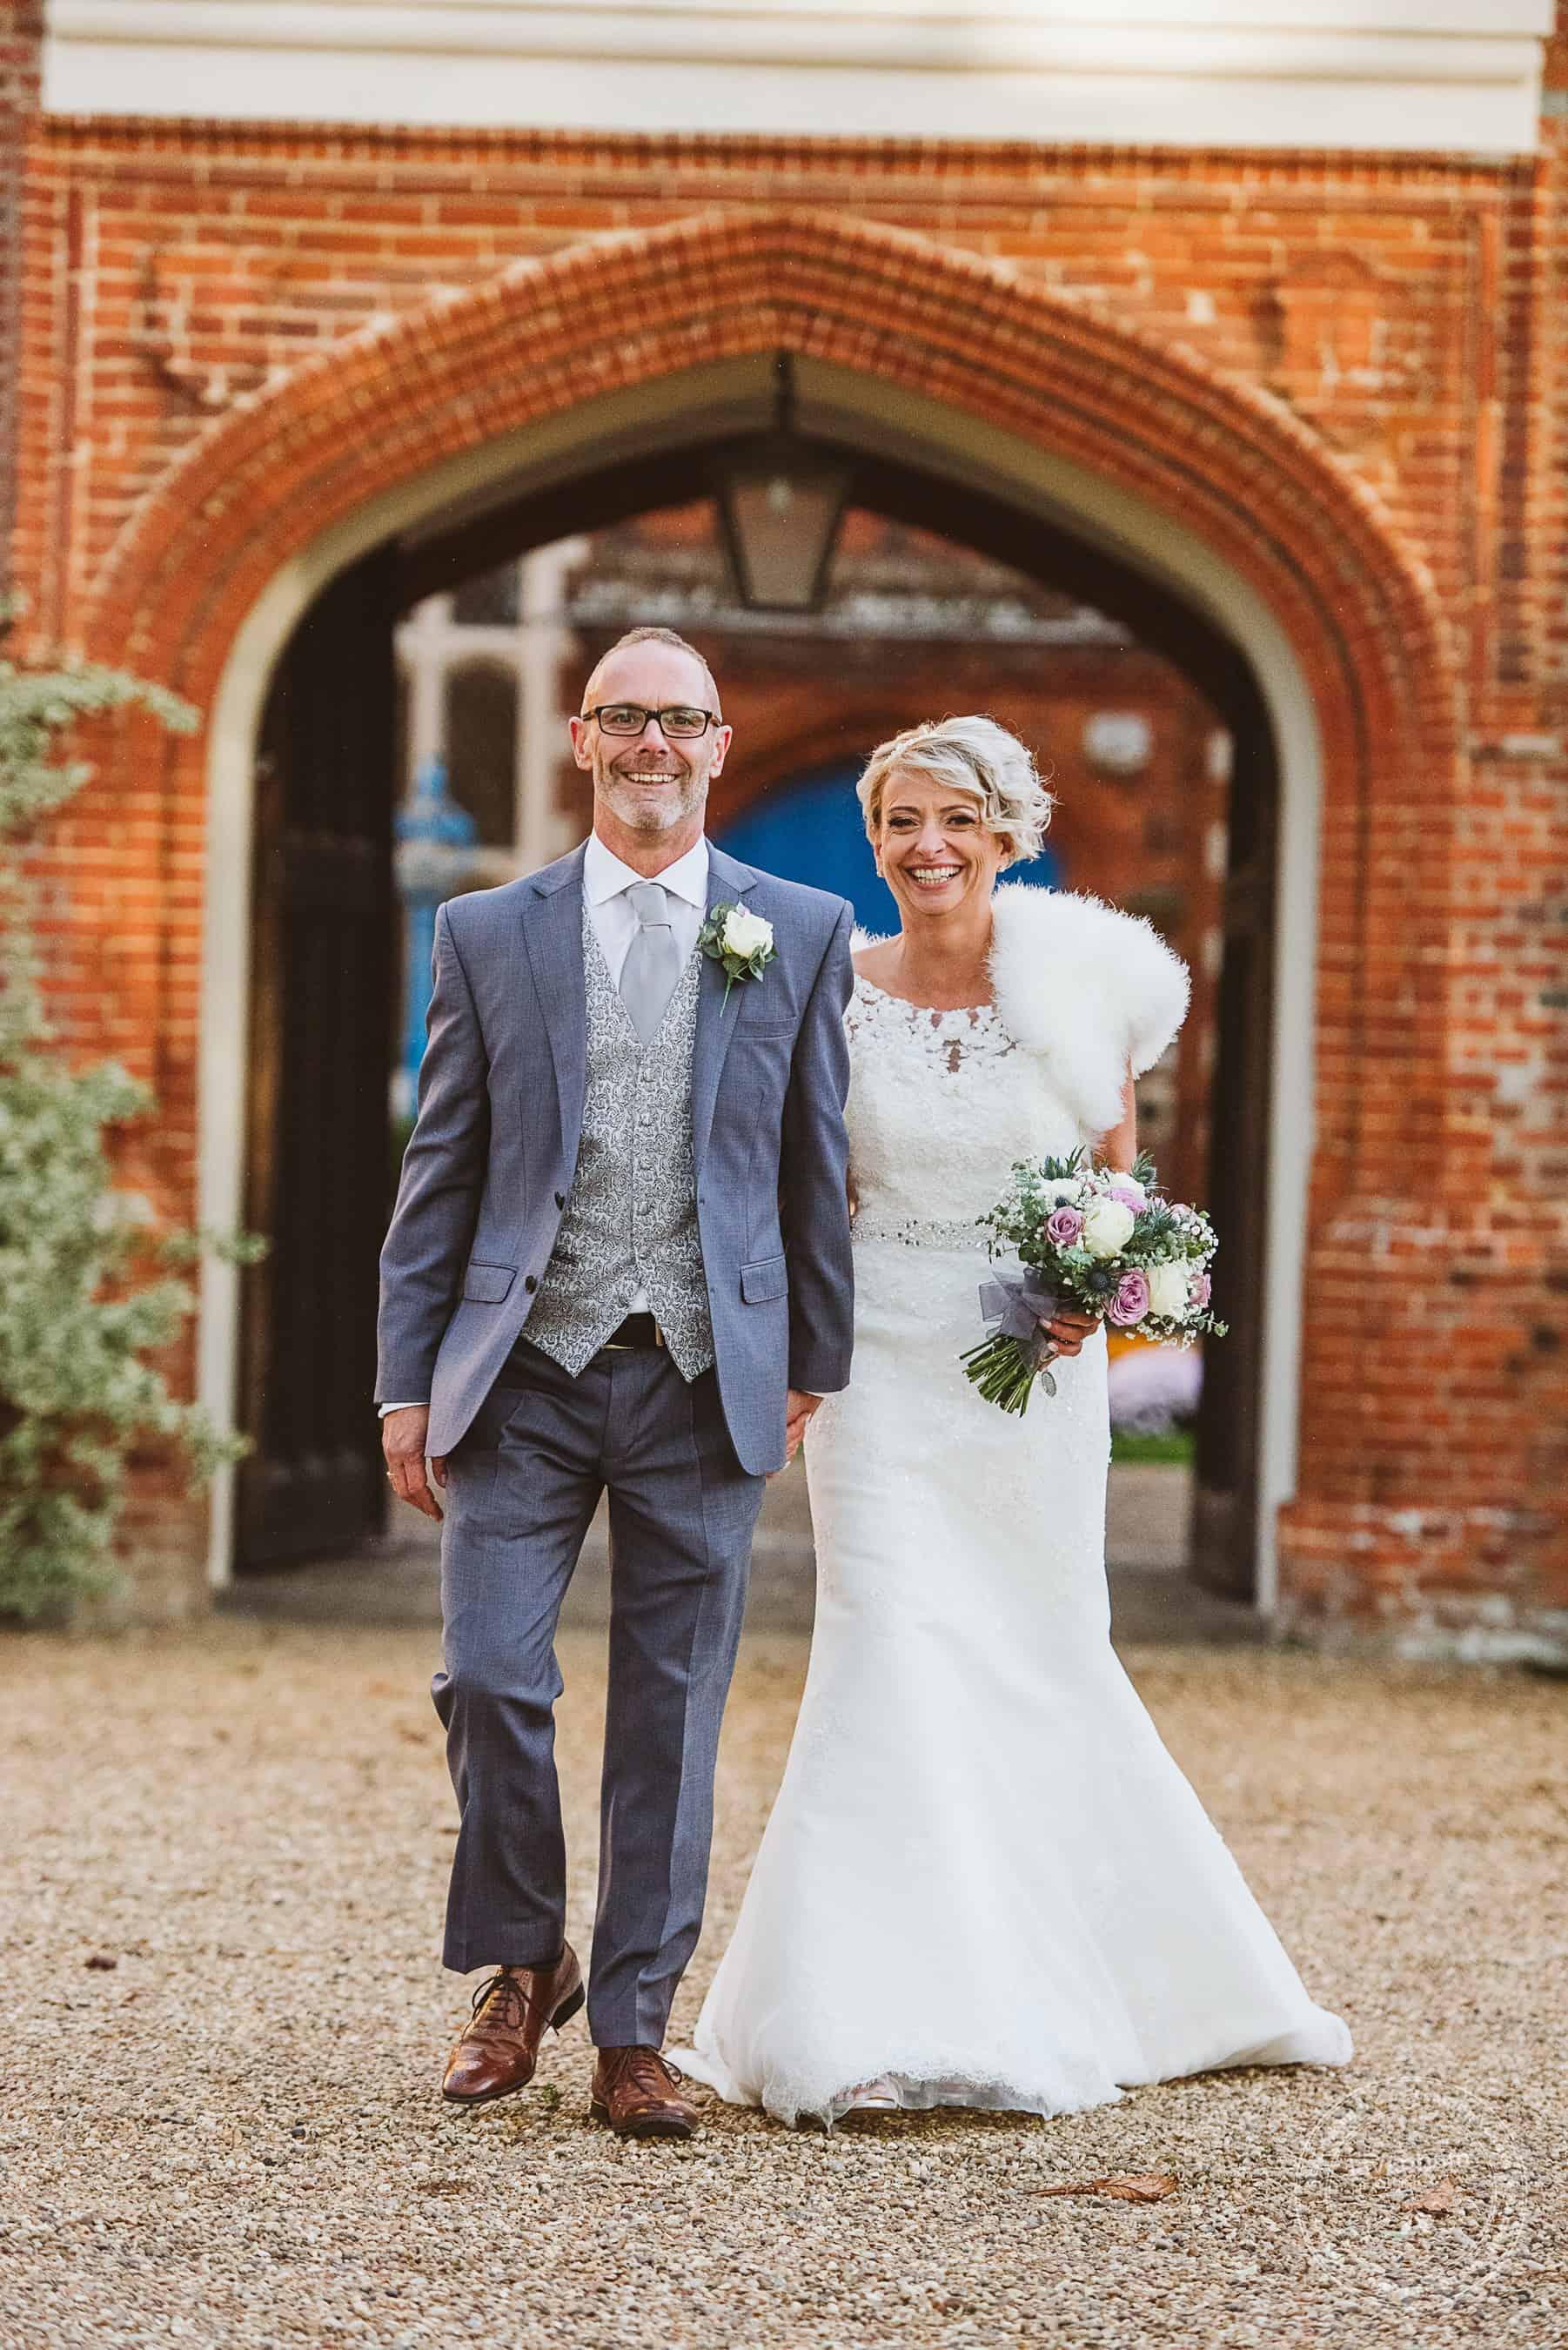 281018 Gosfield Hall Wedding Photography Lavenham Photographic 083